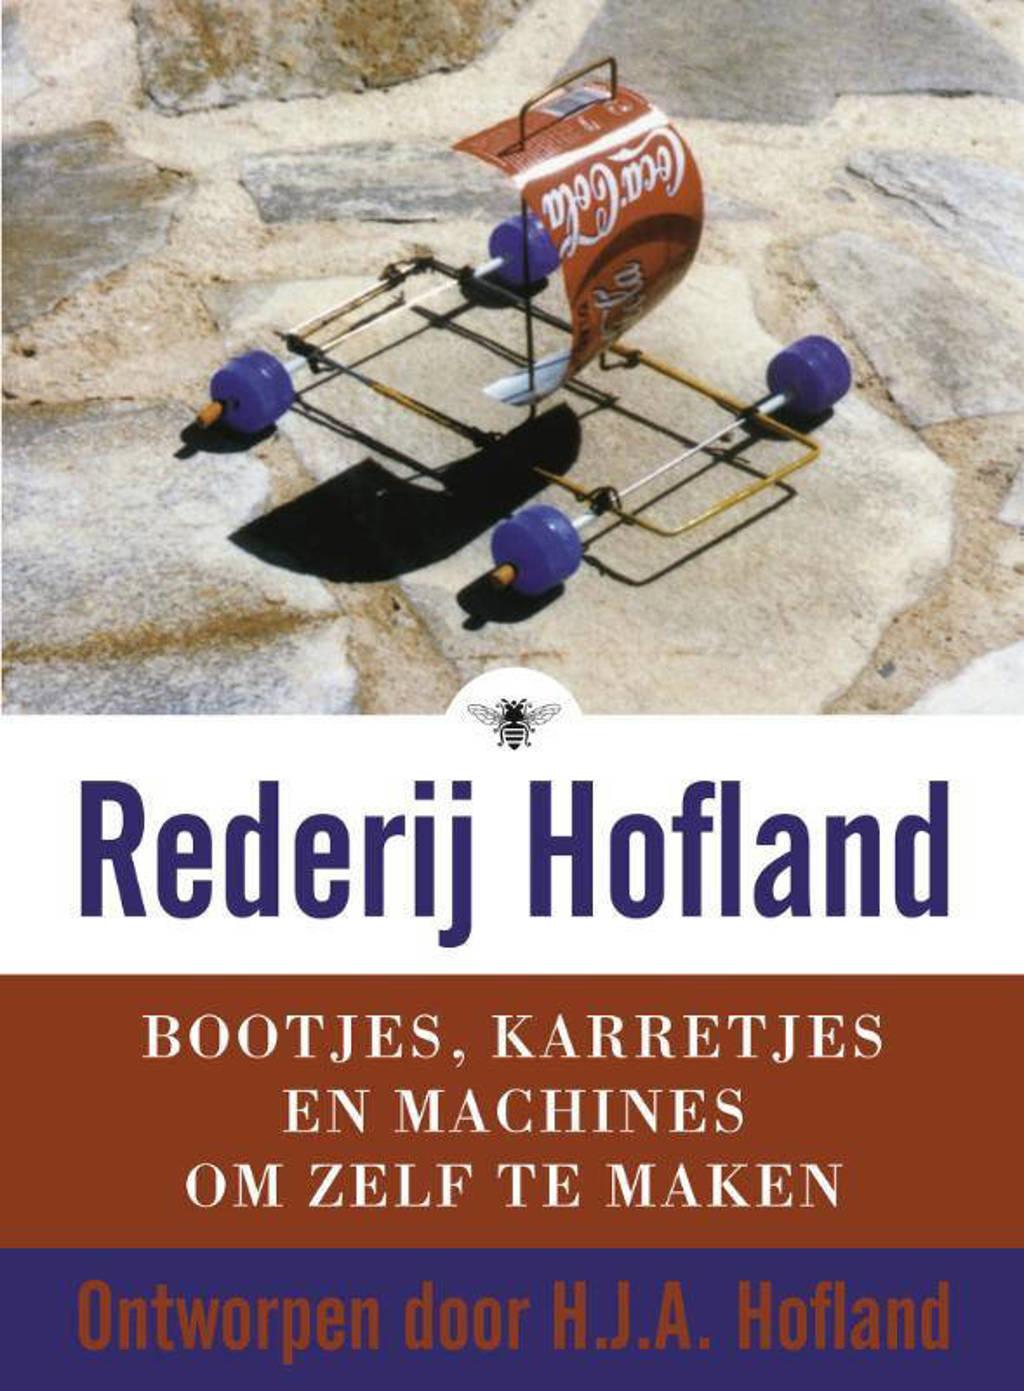 Rederij Hofland - H.J.A. Hofland